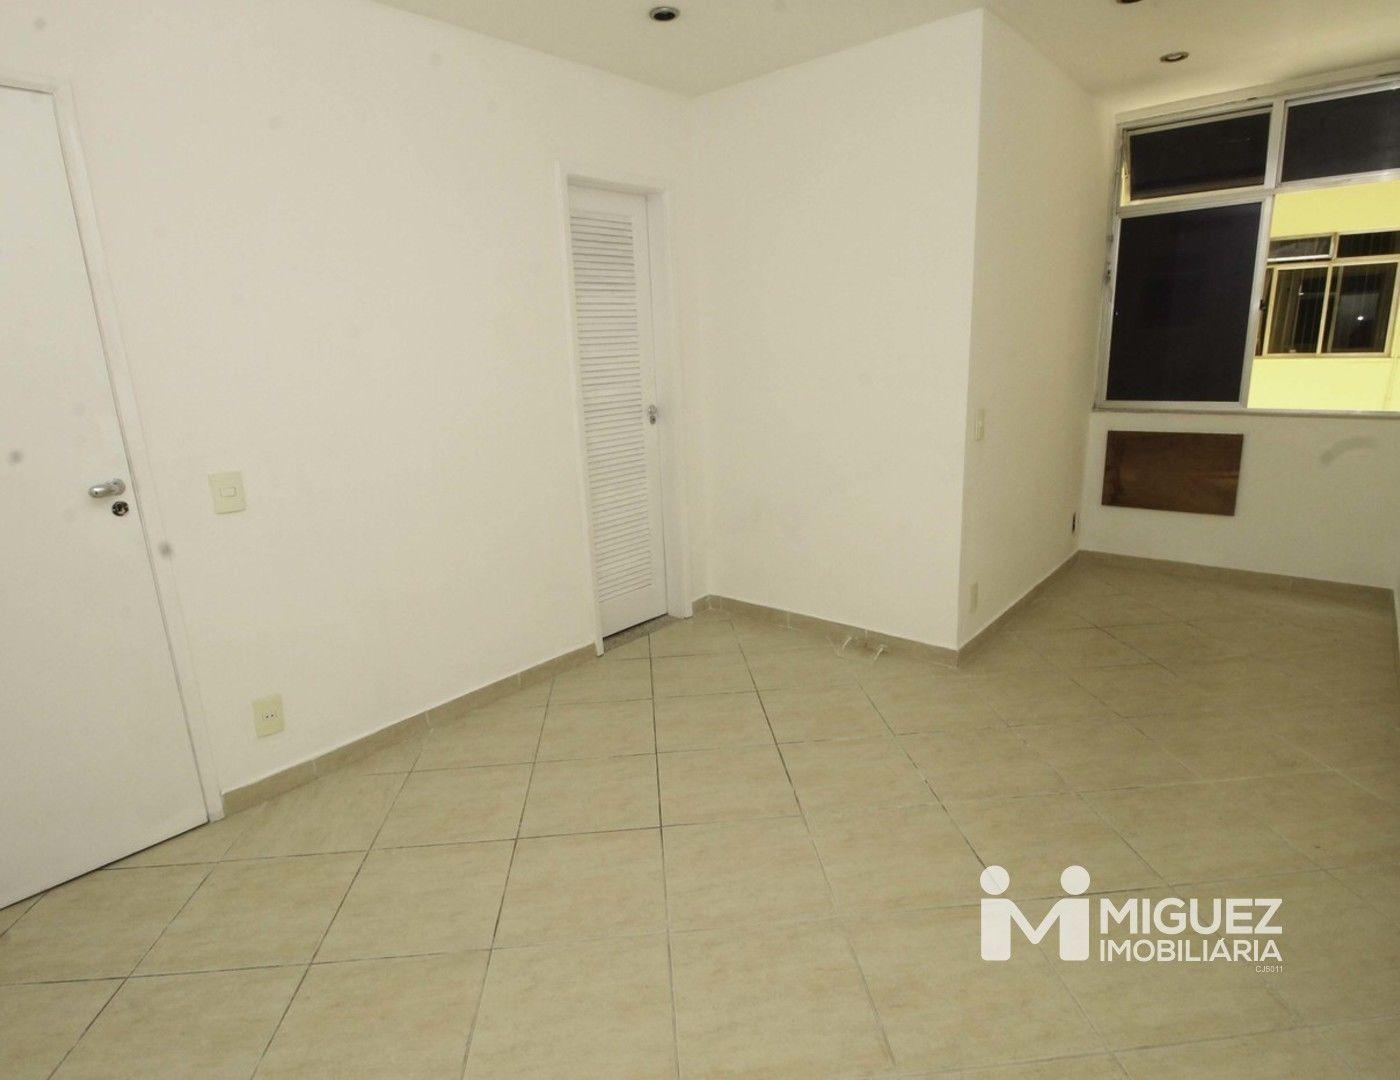 Apartamento, venda, Avenida Maracanã - Vila Isabel , Rio de janeiro